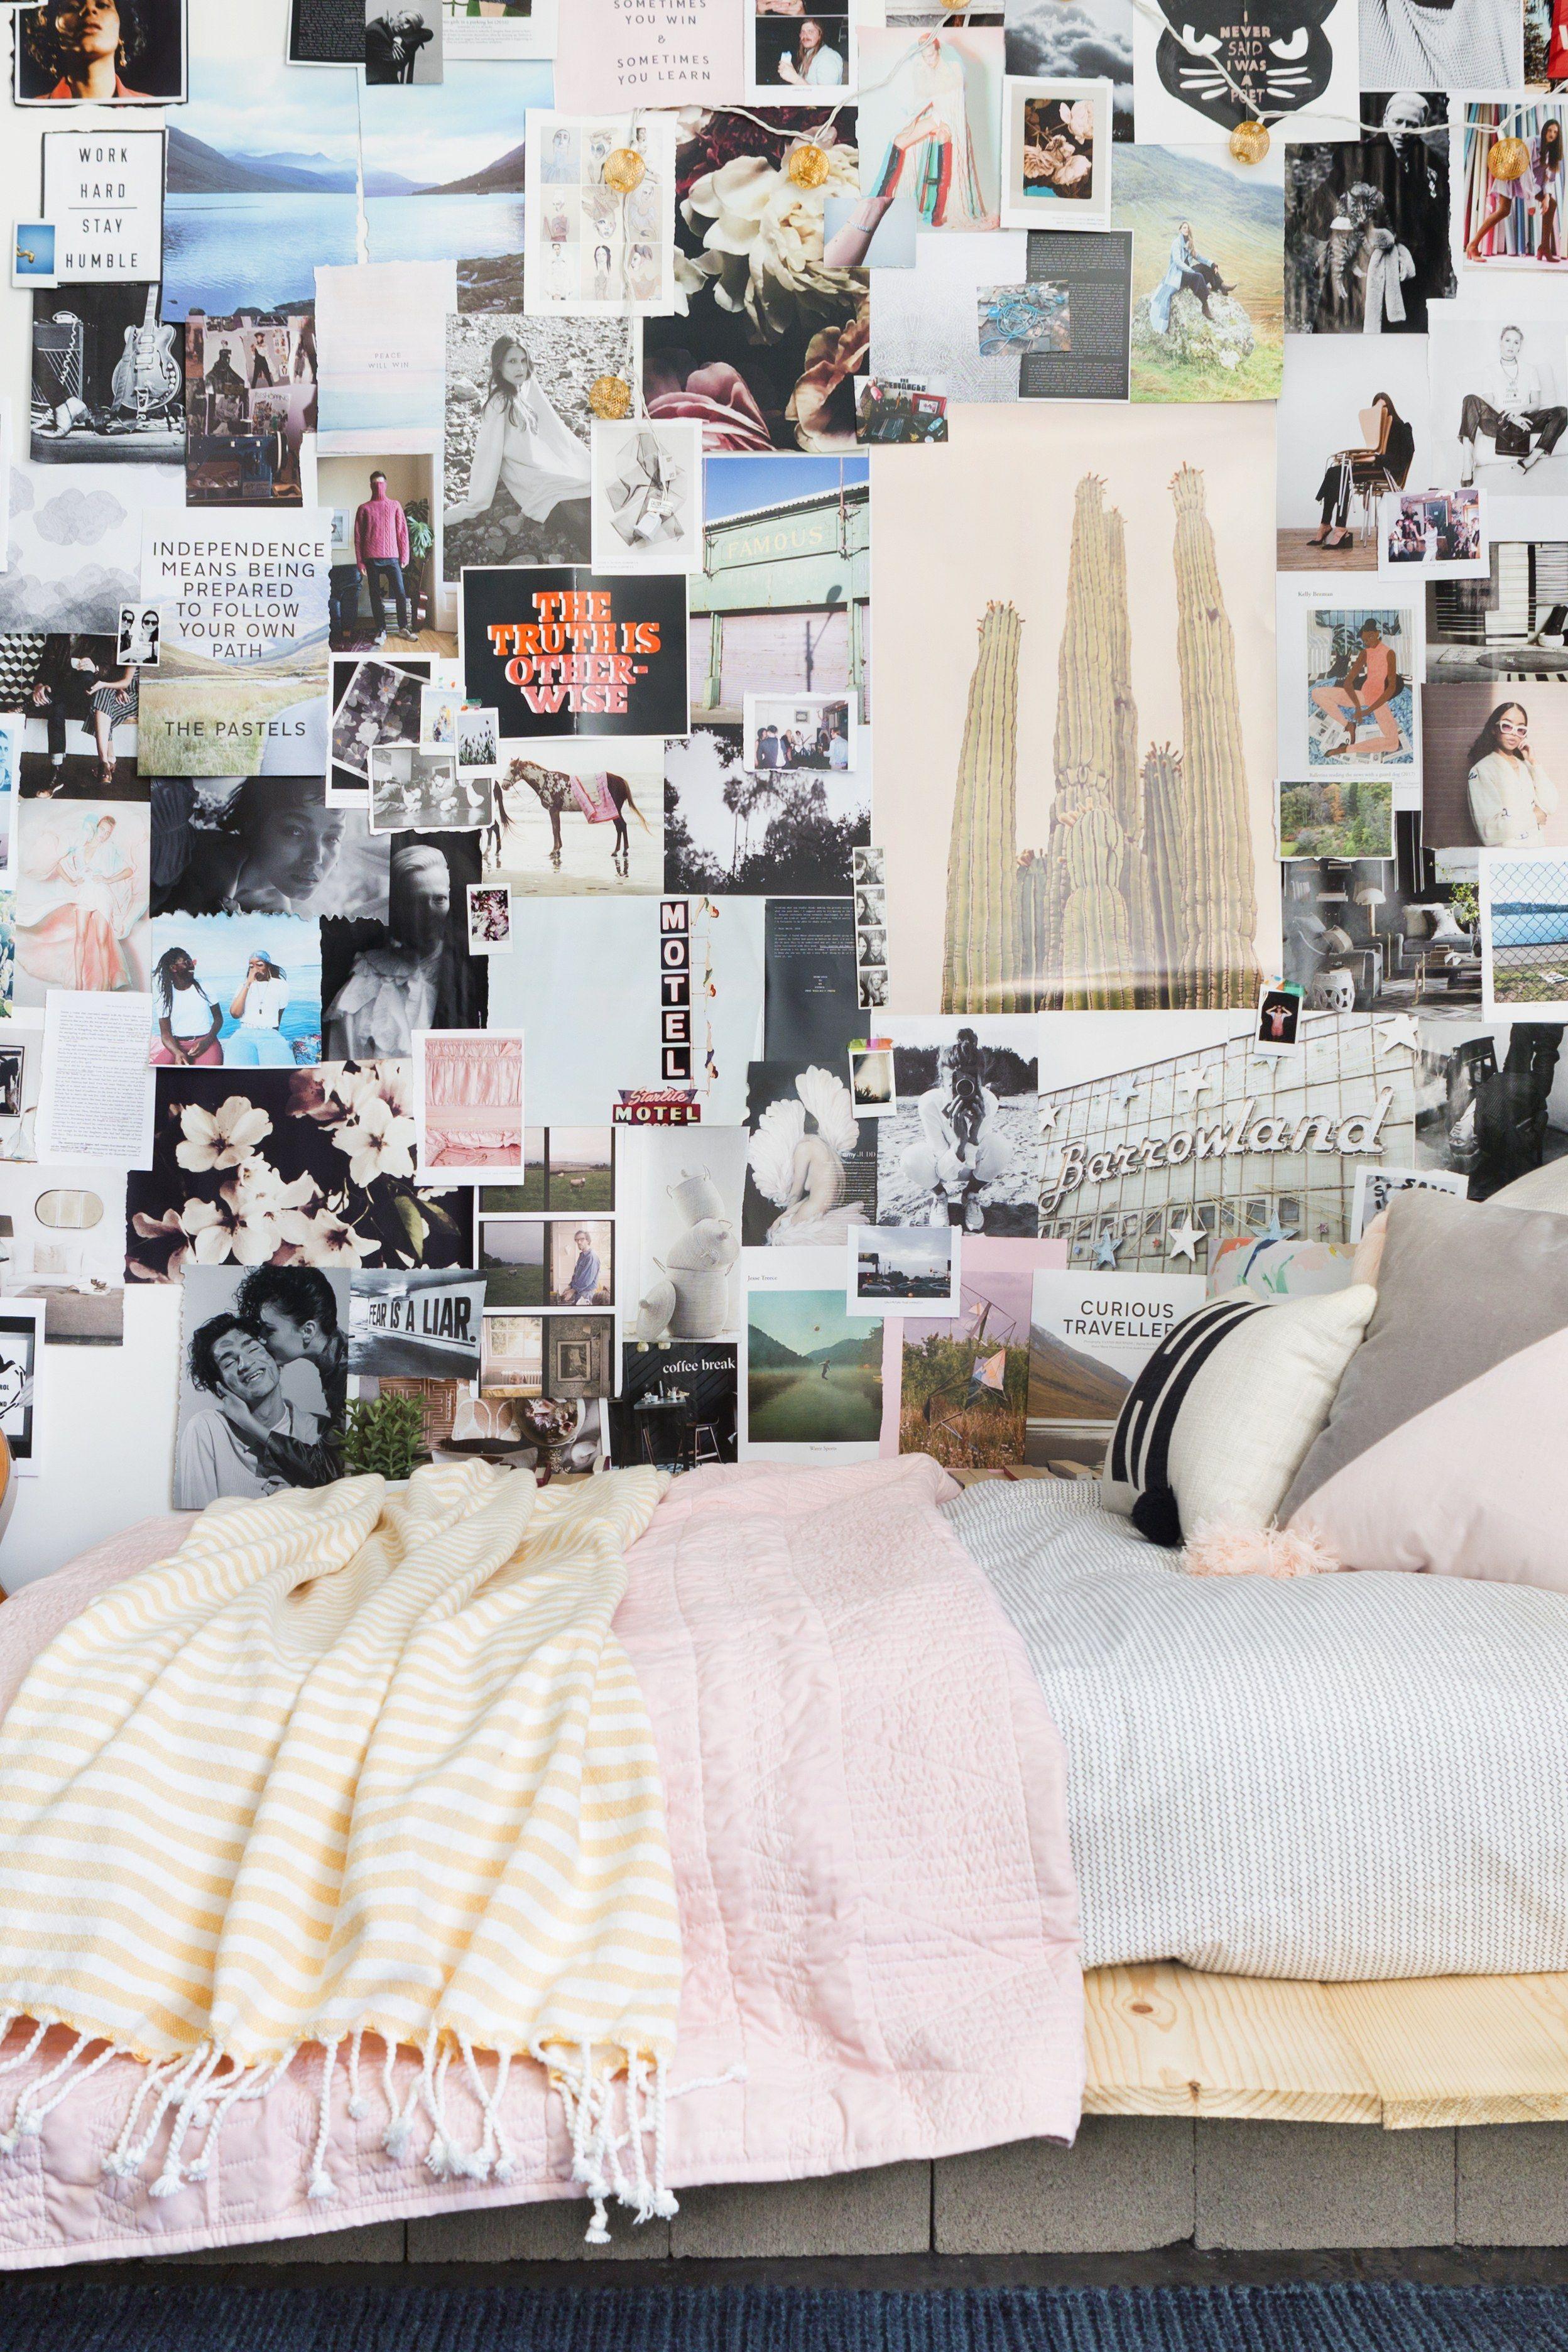 Aesthetic Dorm Room: Dorm Decor That Will Make Your New Room Feel Like Home In